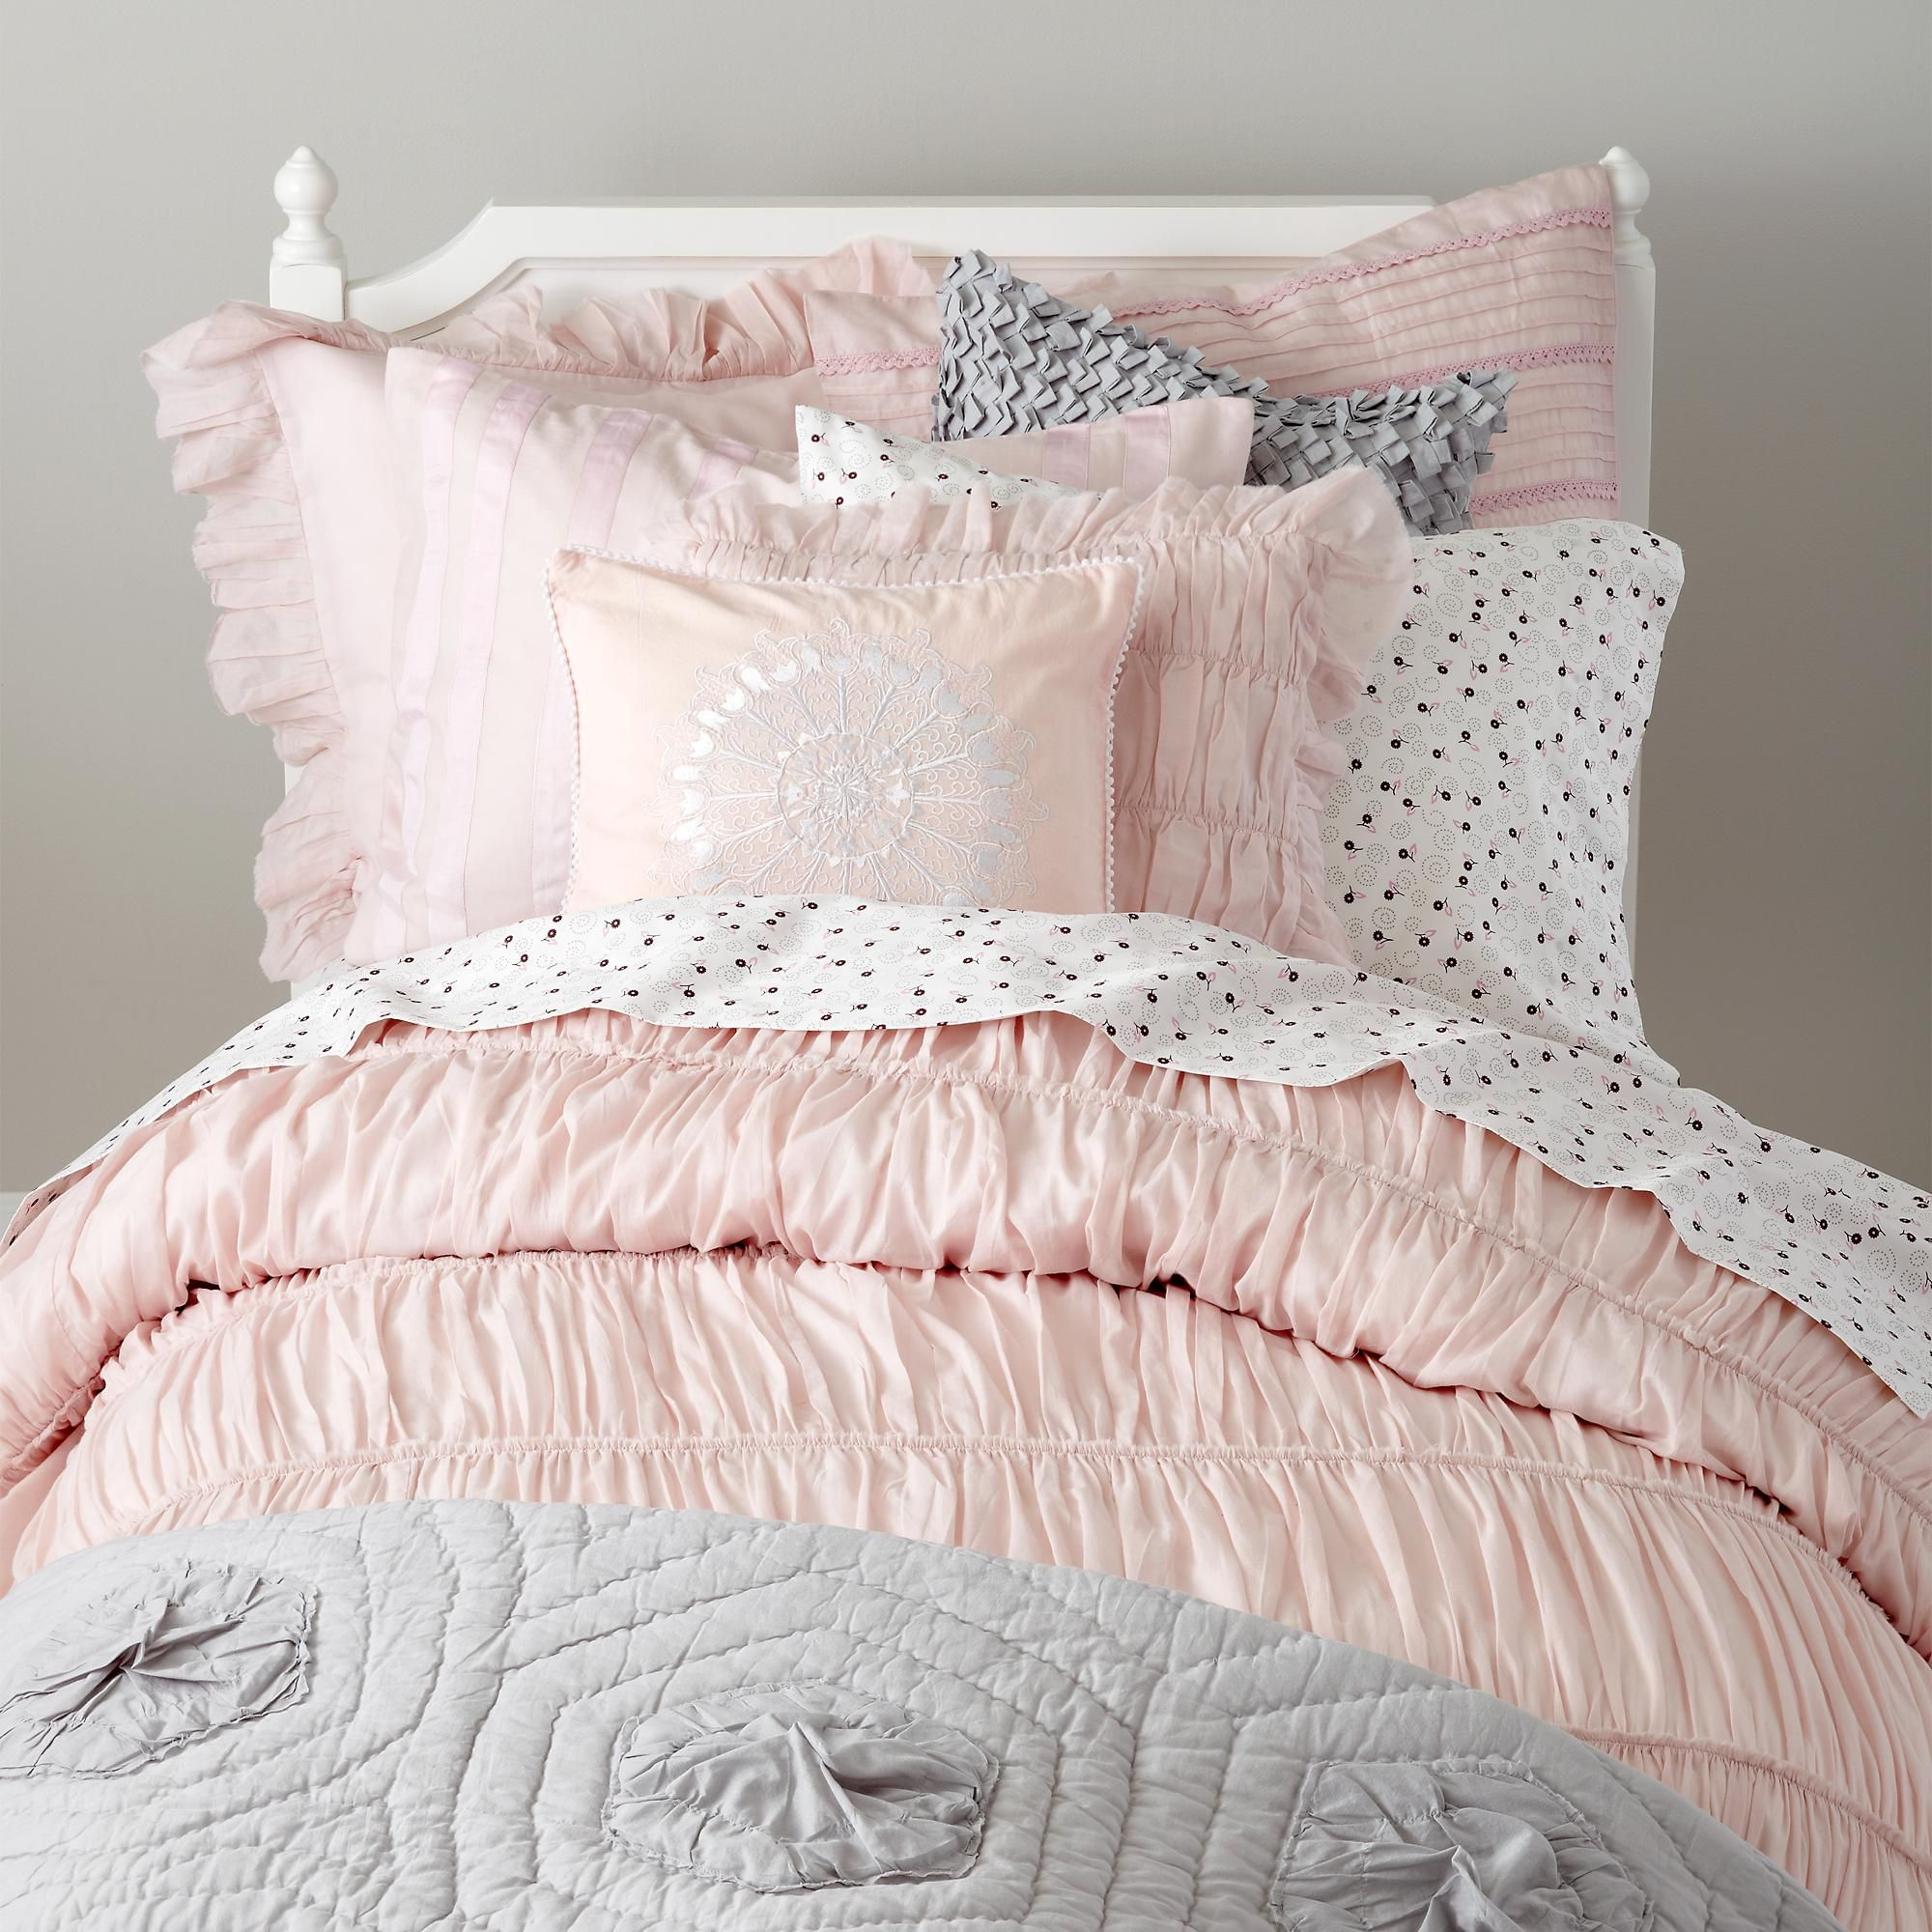 The Land of Nod Girls Bedding Antique Chic Bedding Set